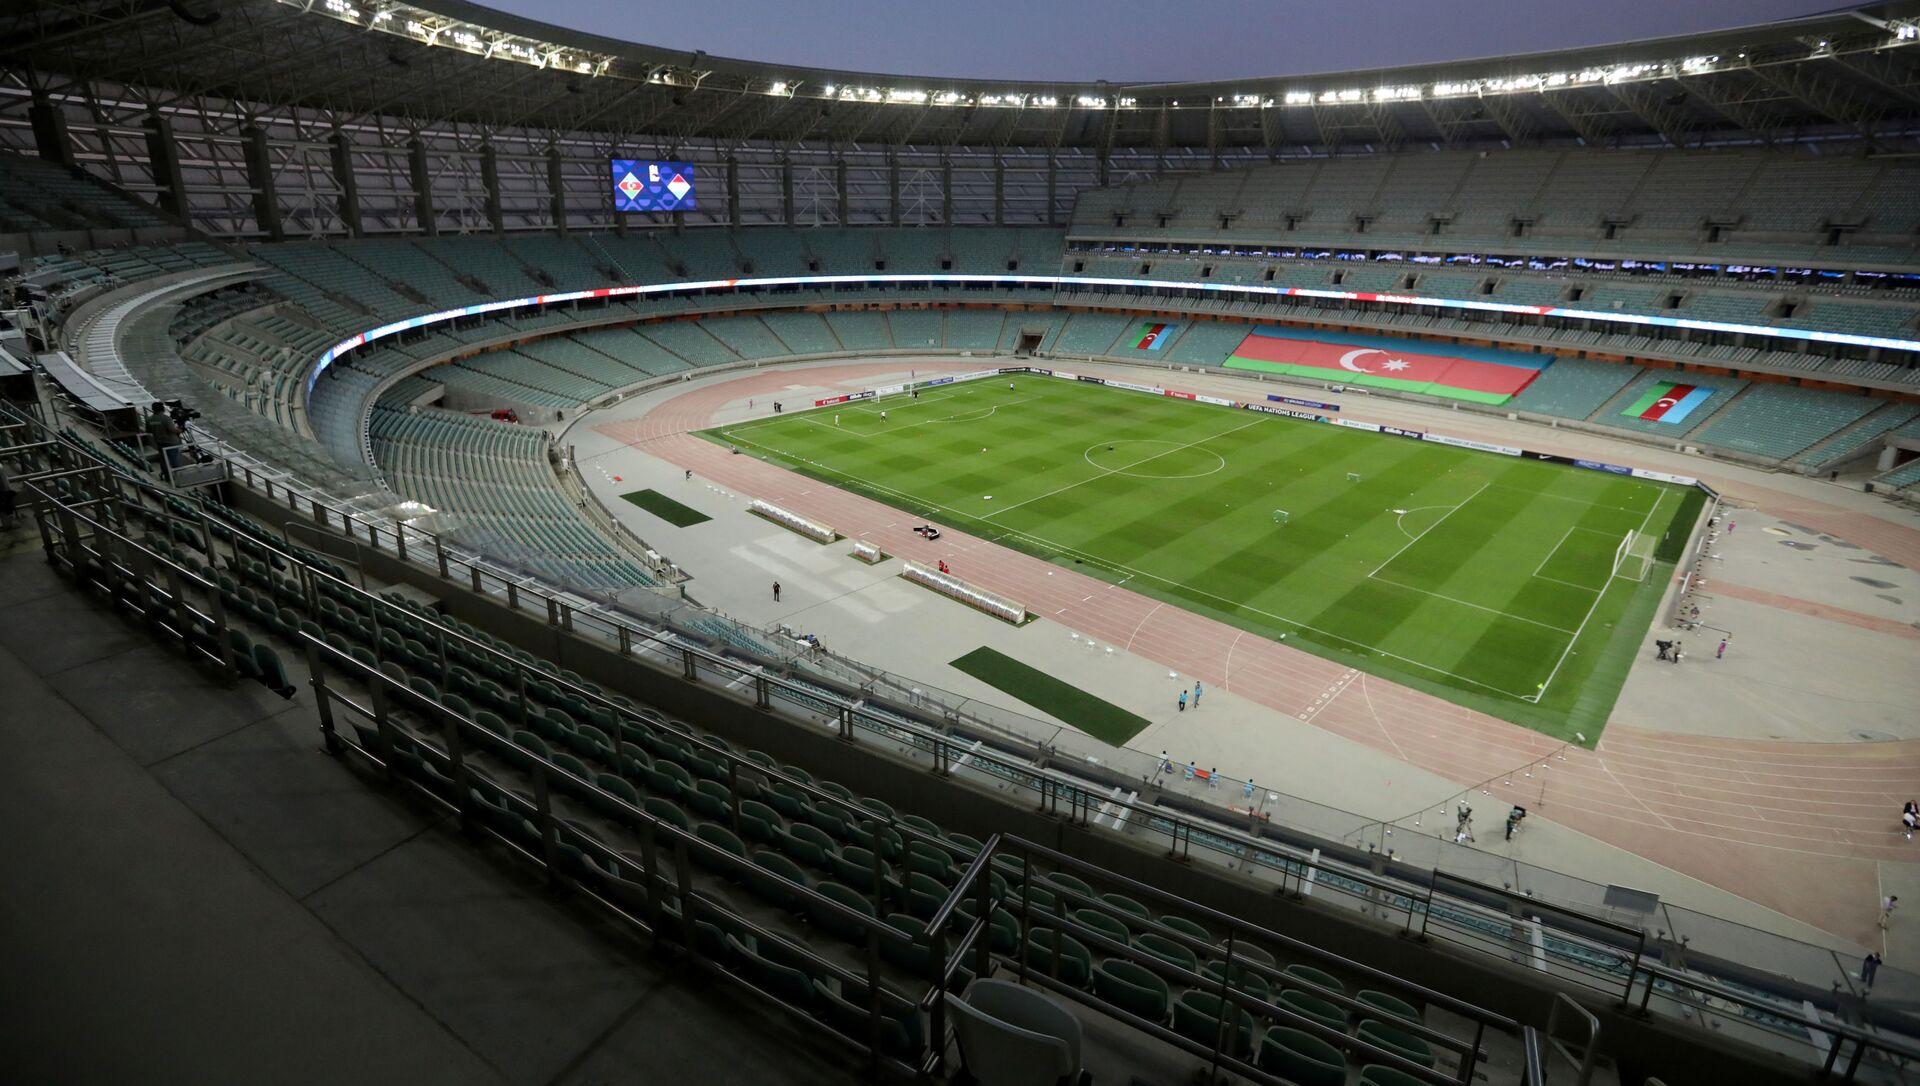 Бакинский Олимпийский стадион, фото из архива  - Sputnik Азербайджан, 1920, 17.06.2021